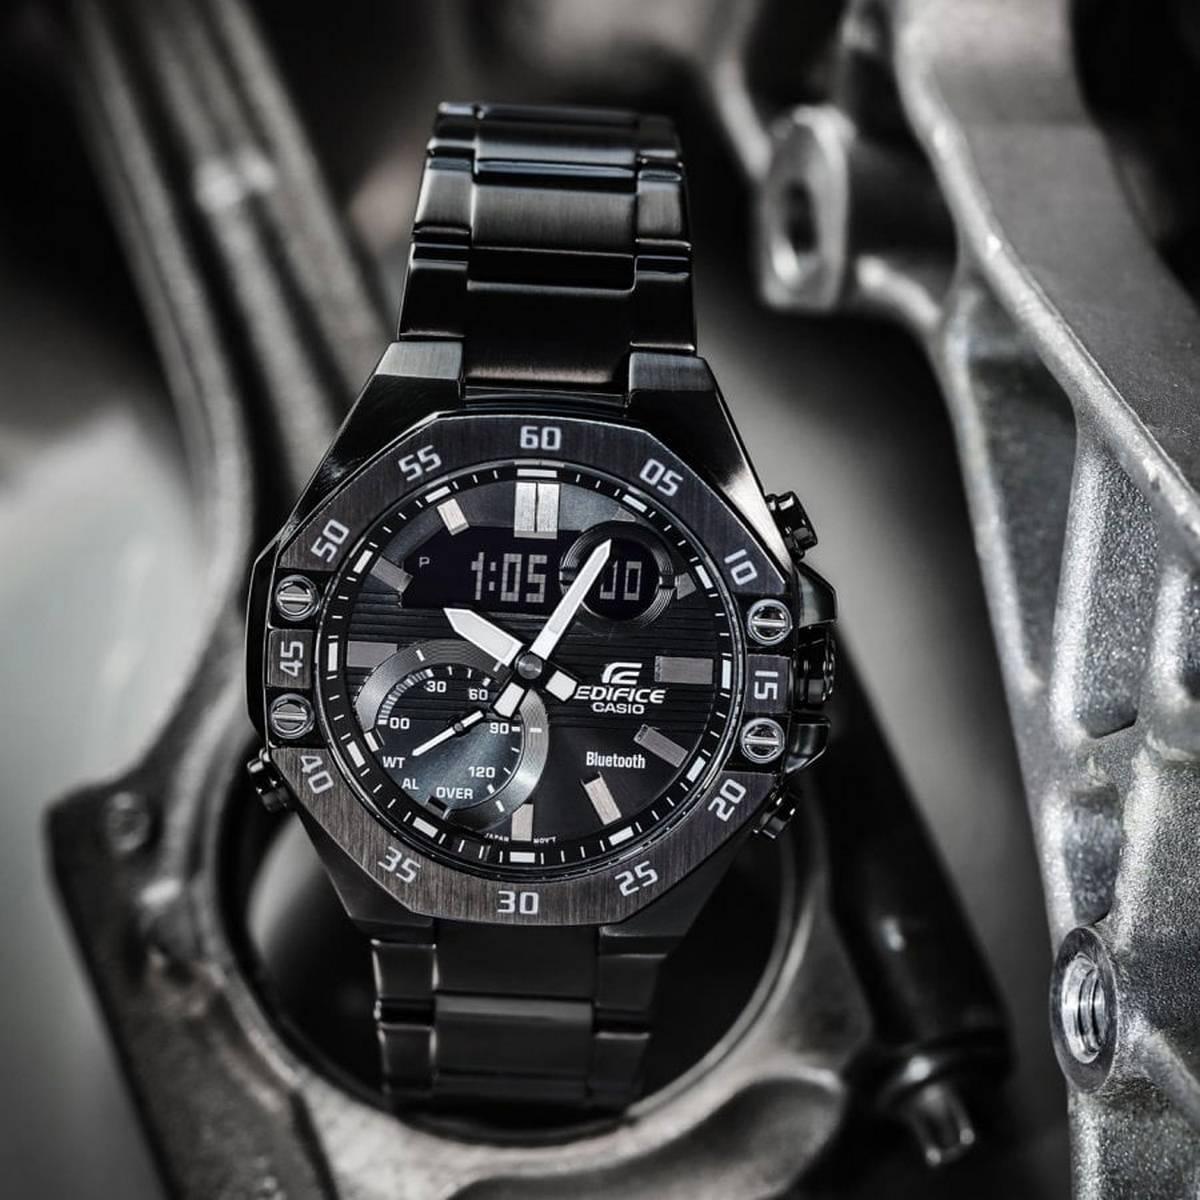 Casio Edifice - ECB-10DC-1ADF - Stainless Steel Wrist Watch for Men - Smart Phone Link - Bluetooth Watch